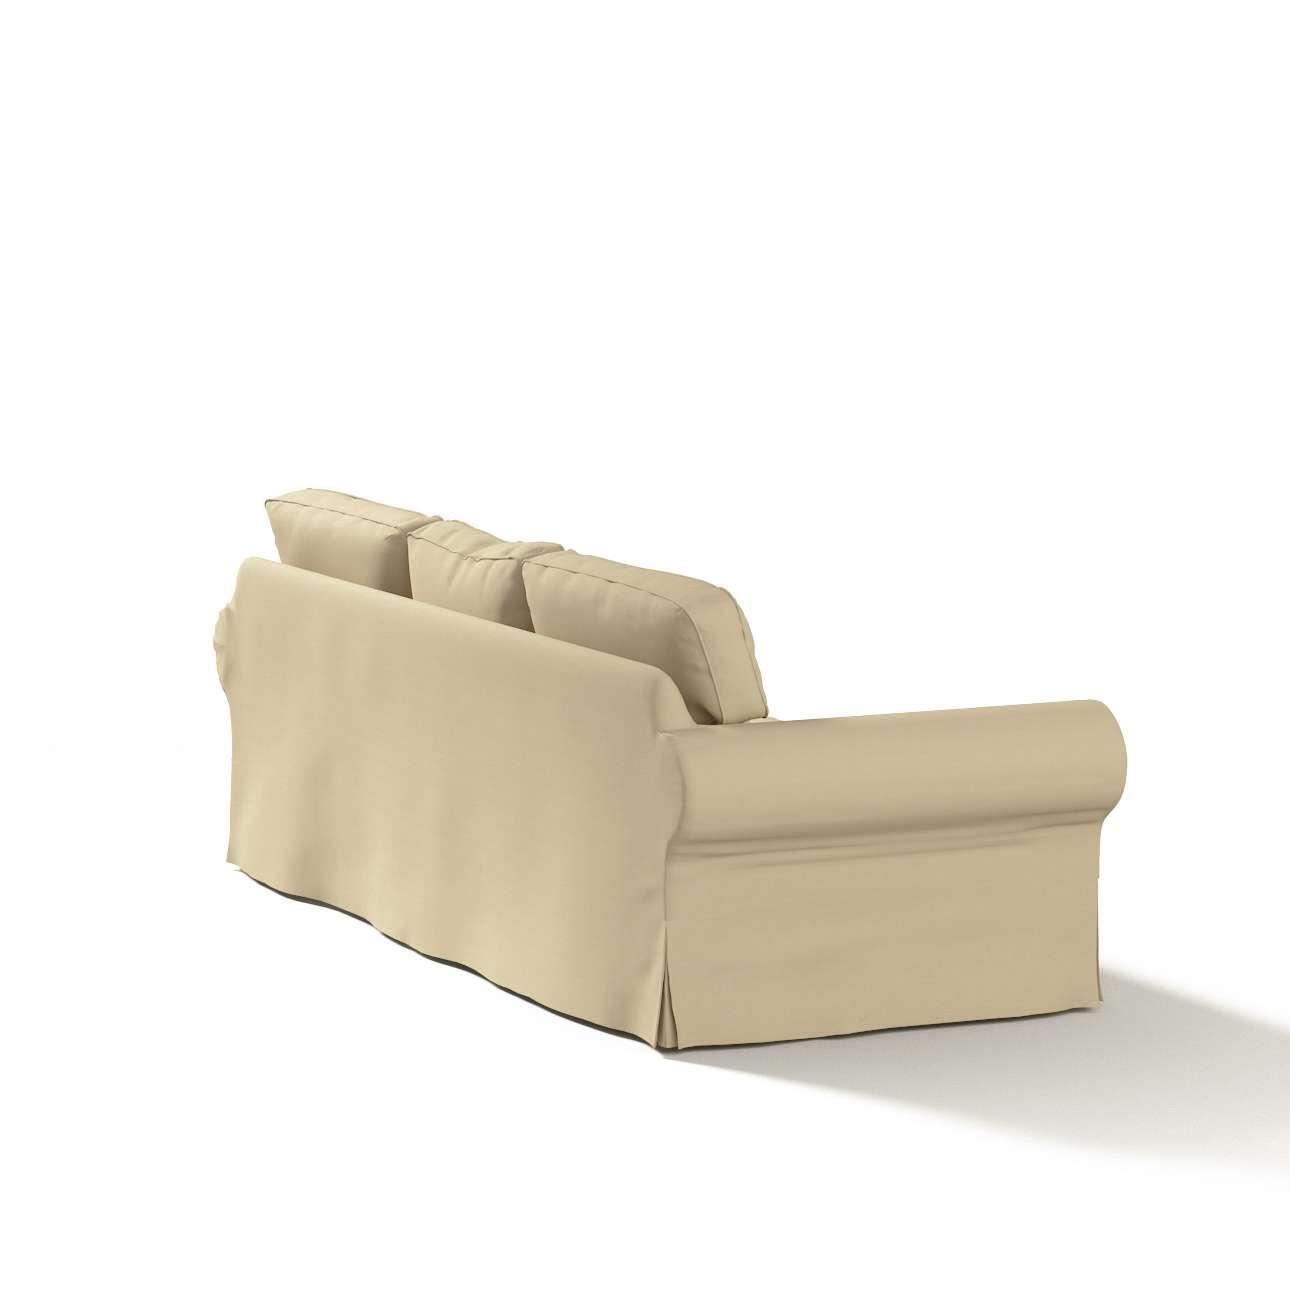 Ektorp 3-Sitzer Schlafsofabezug neues Modell (2013) Ektorp 3-Sitzer, ausklappbar, neues Modell ( 2013) von der Kollektion Cotton Panama, Stoff: 702-01